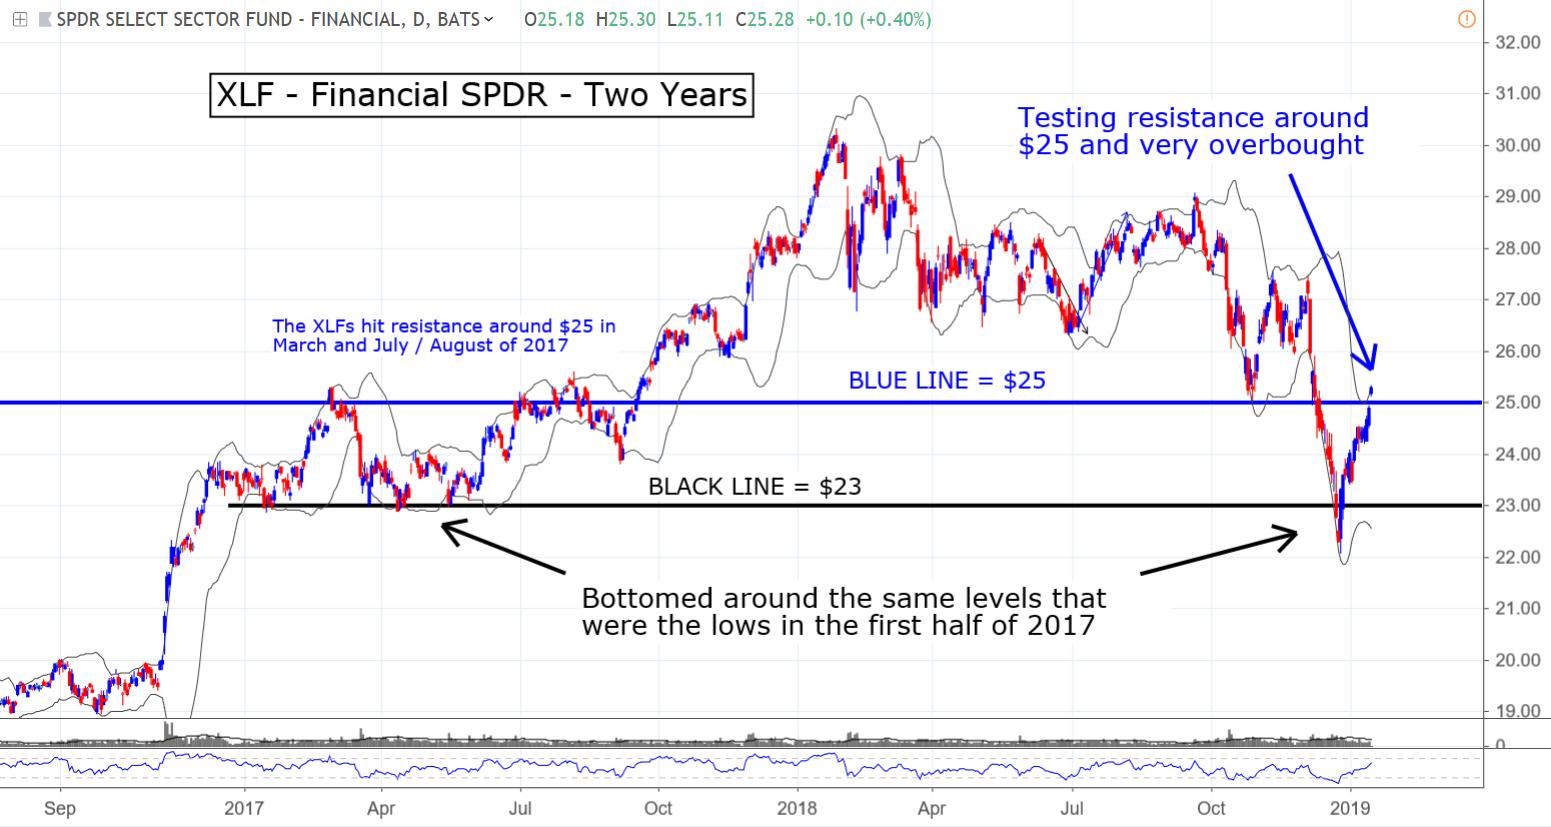 XLP financial SPDR